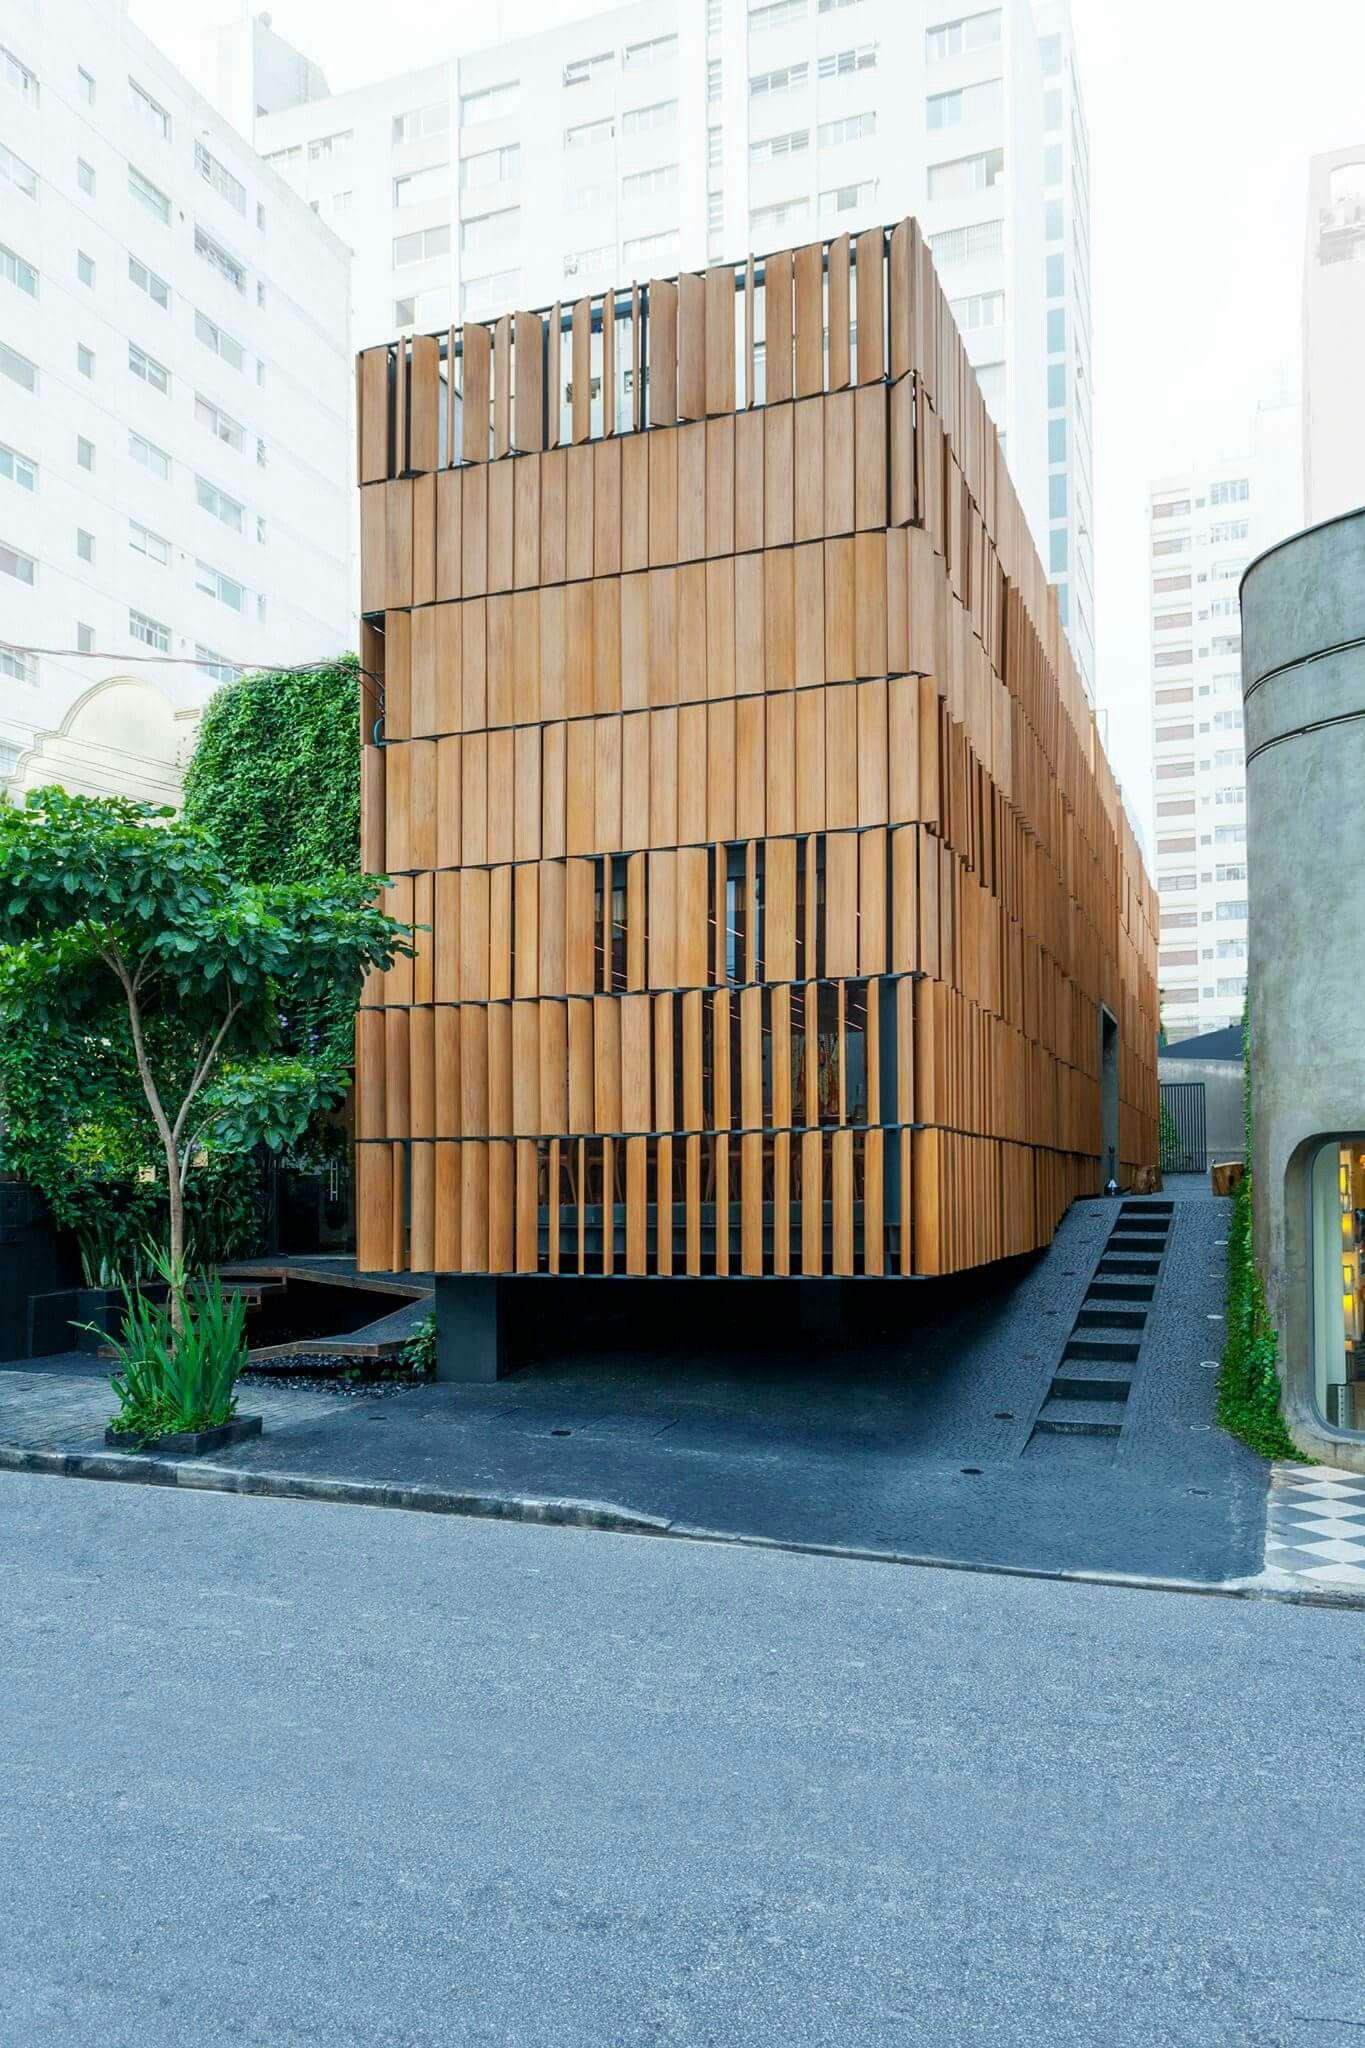 holz fassade architektur pinterest facades architecture and arch. Black Bedroom Furniture Sets. Home Design Ideas